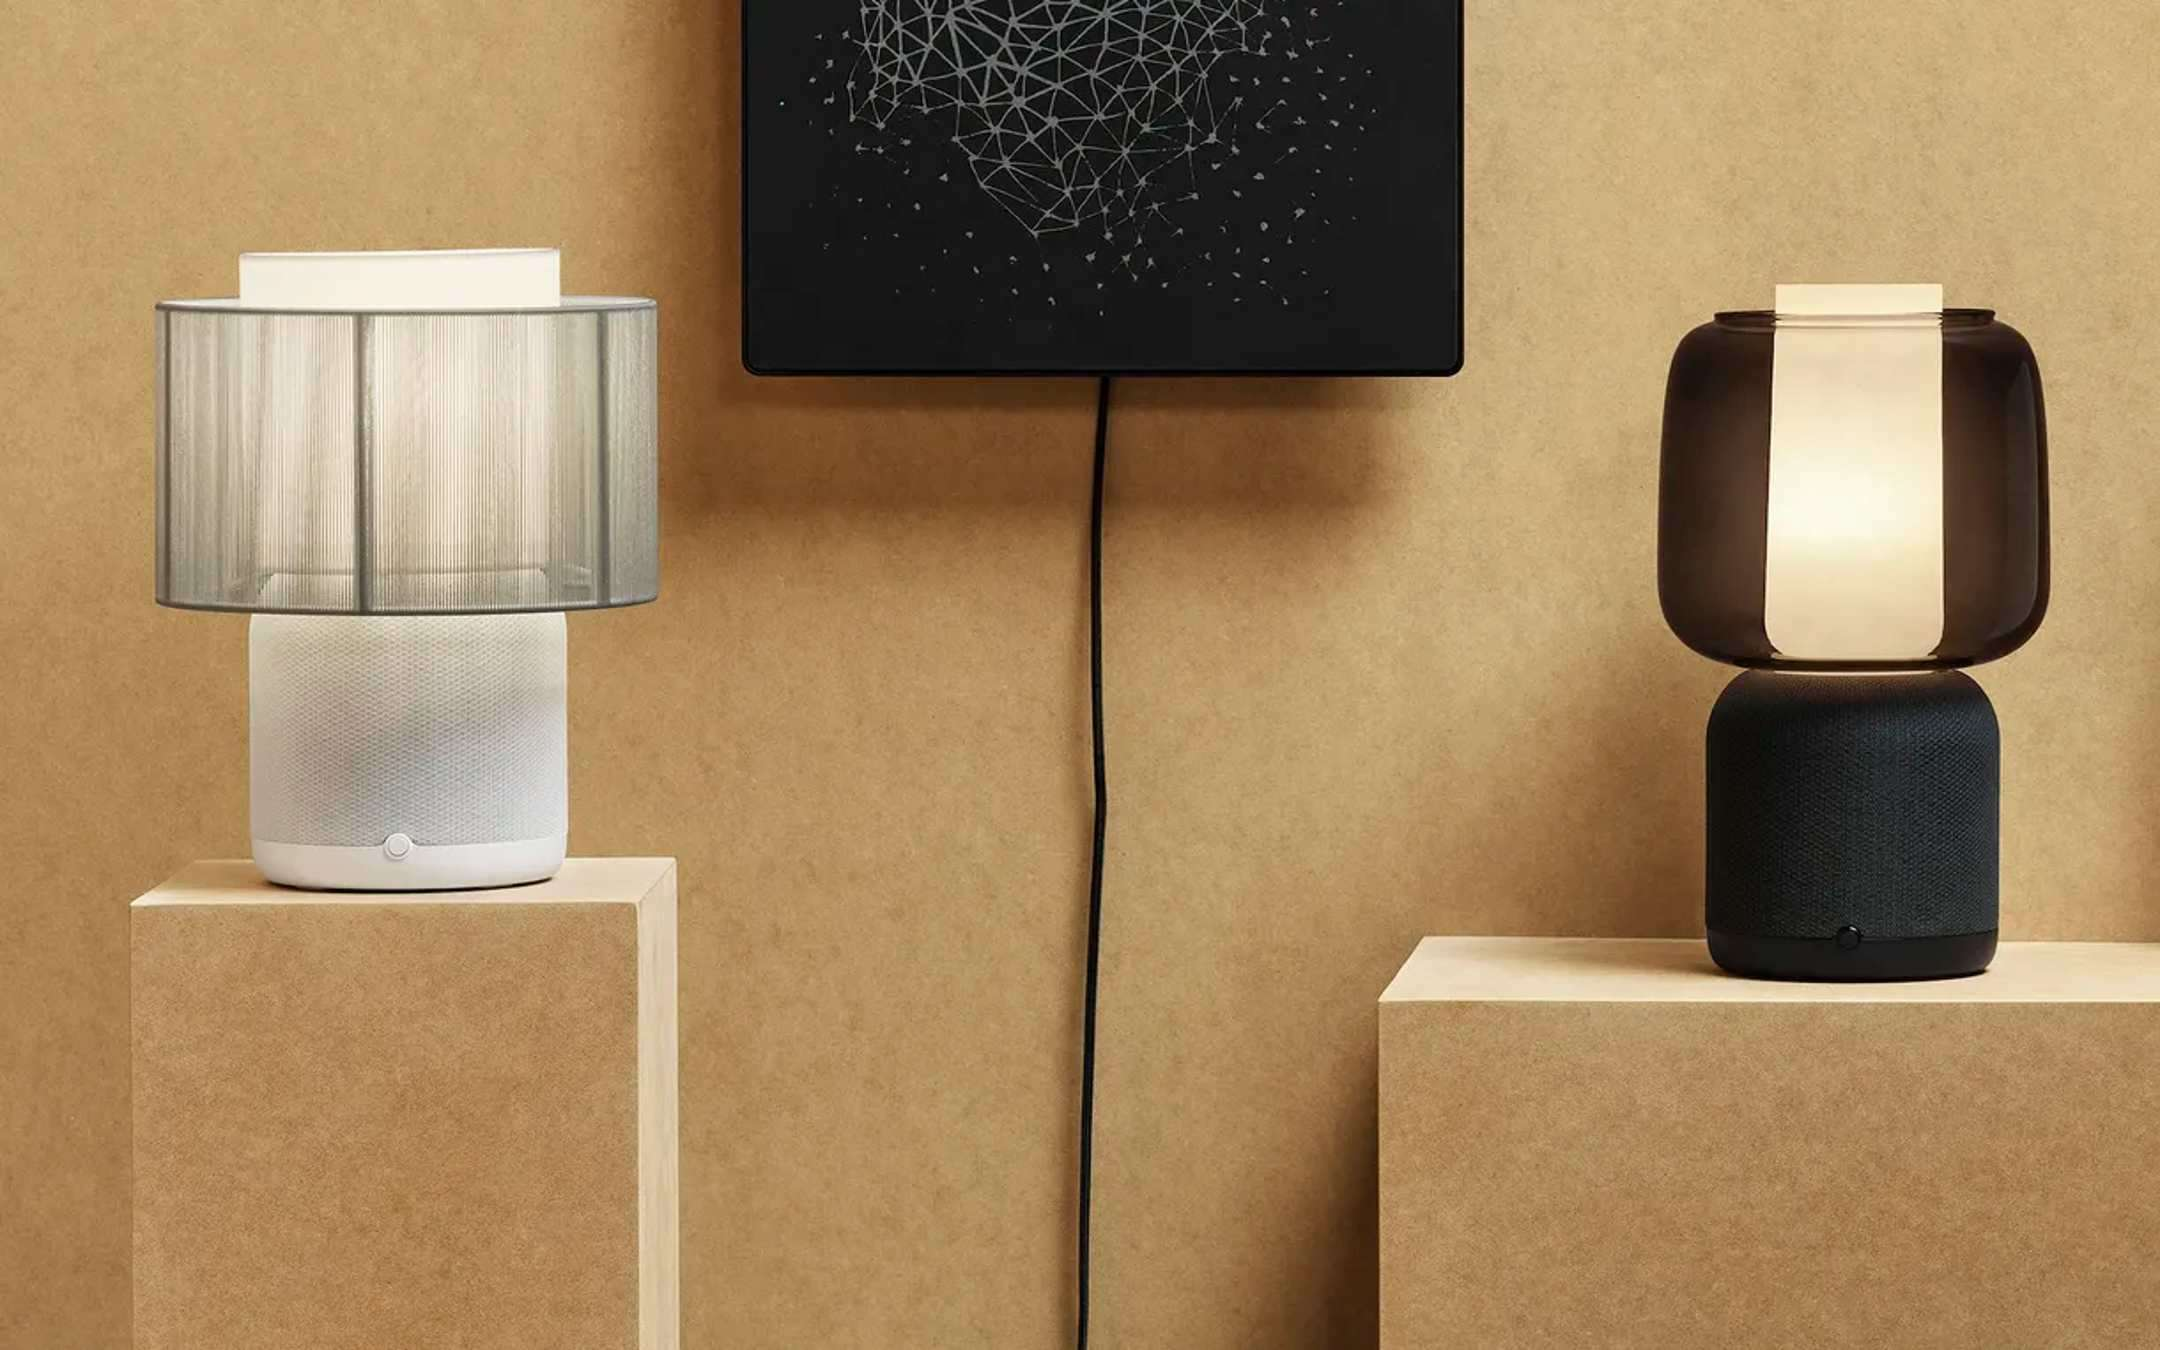 Ikea e Sonos: ecco la nuova lampada speaker Symfonisk